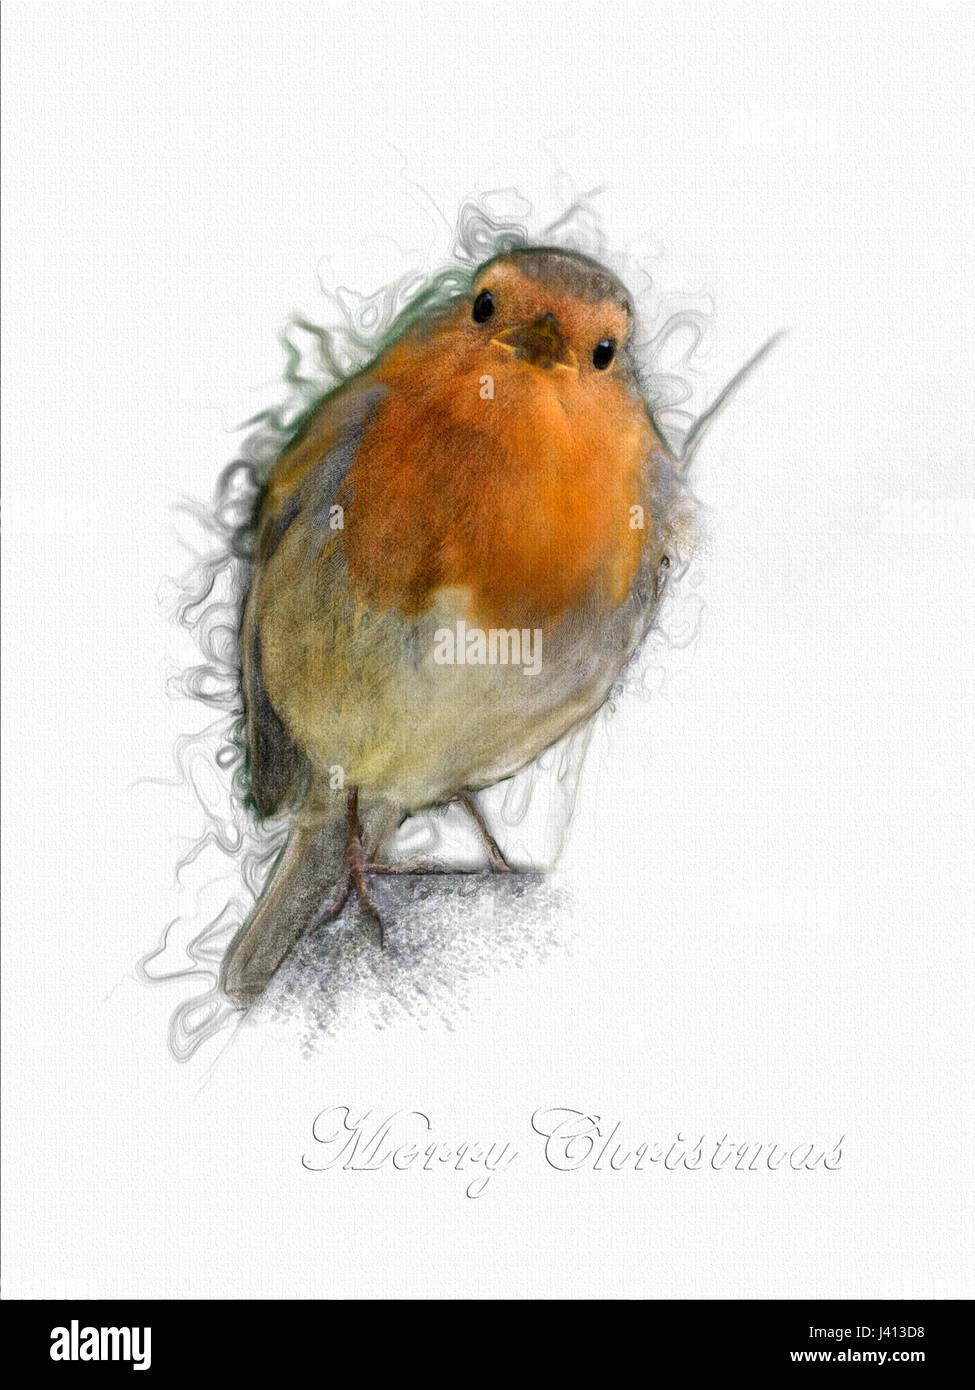 Robin singing Christmas greeting card Stock Photo: 140166244 - Alamy